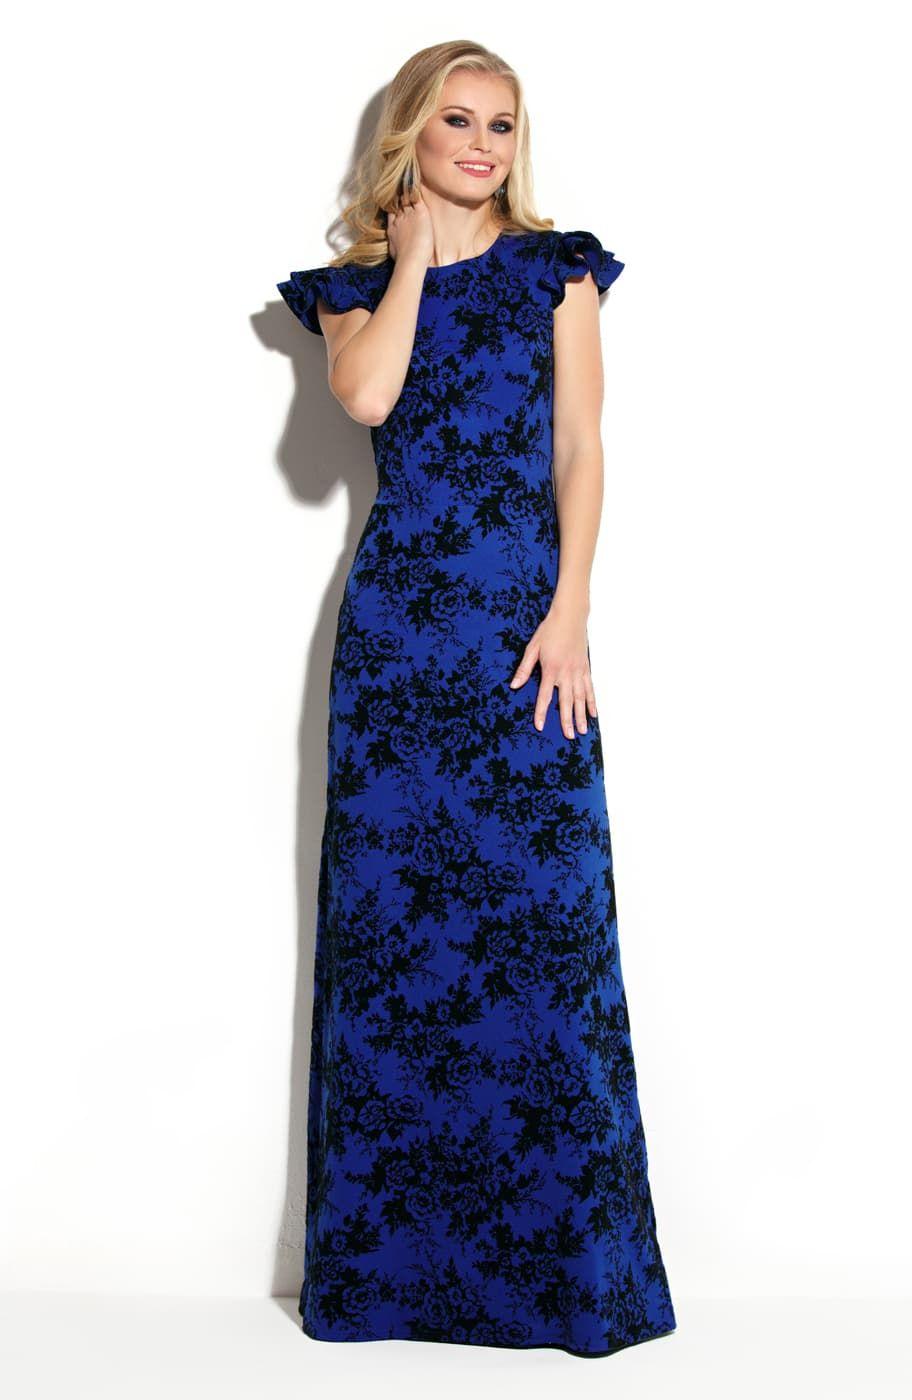 Вечернее платье Donna-Saggia DSP-257-7t от производителя 5f961bc6111